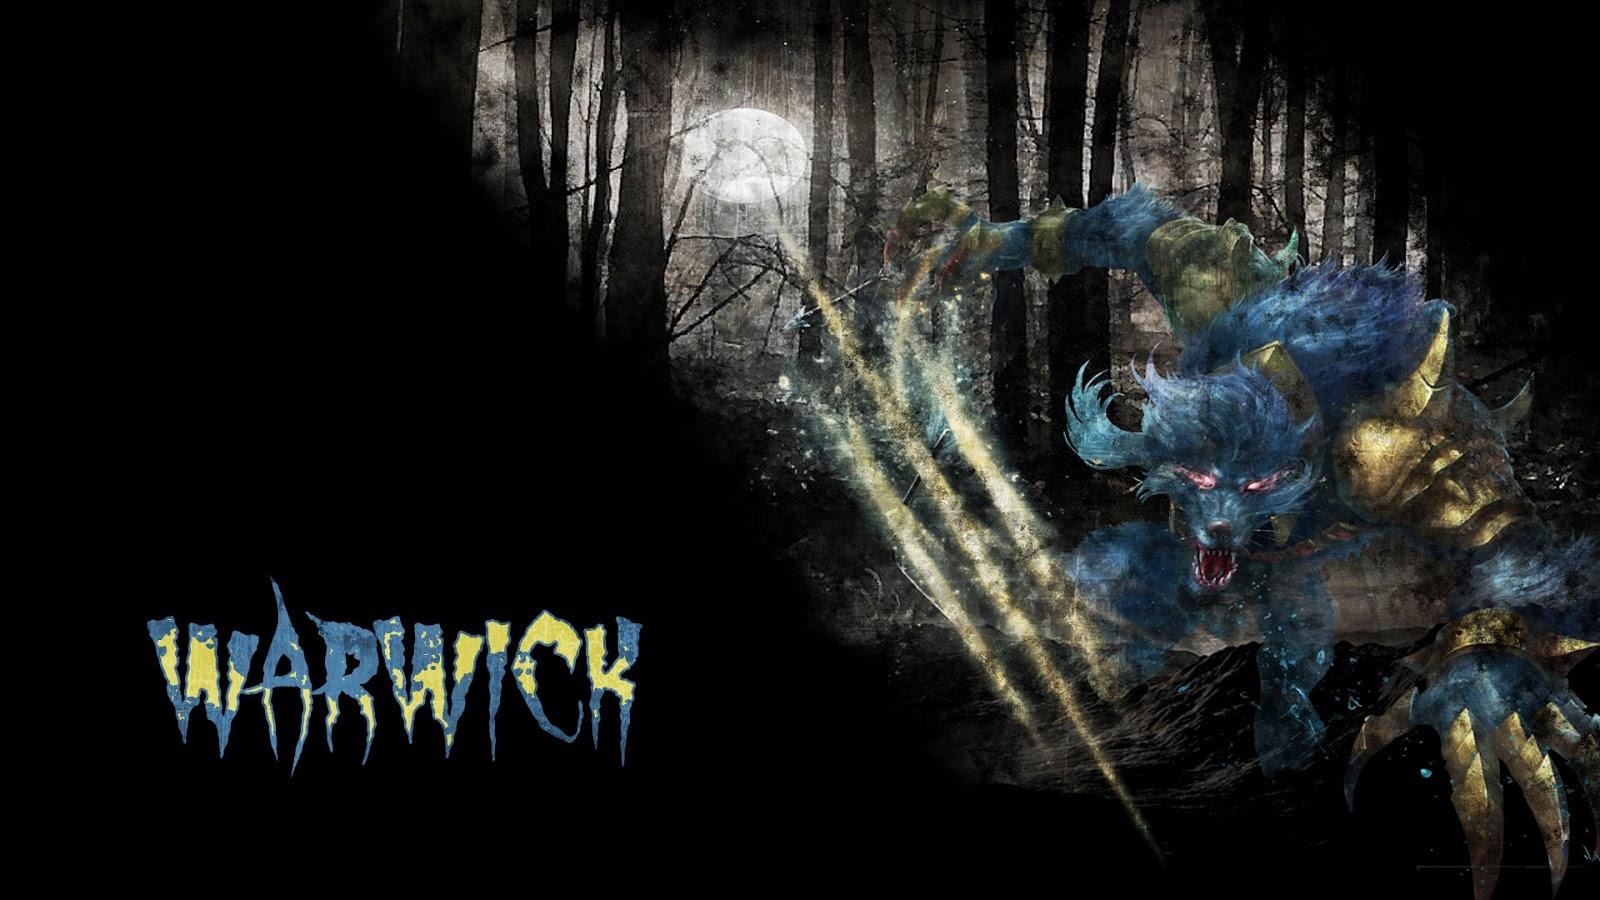 warwick wallpaper - photo #3